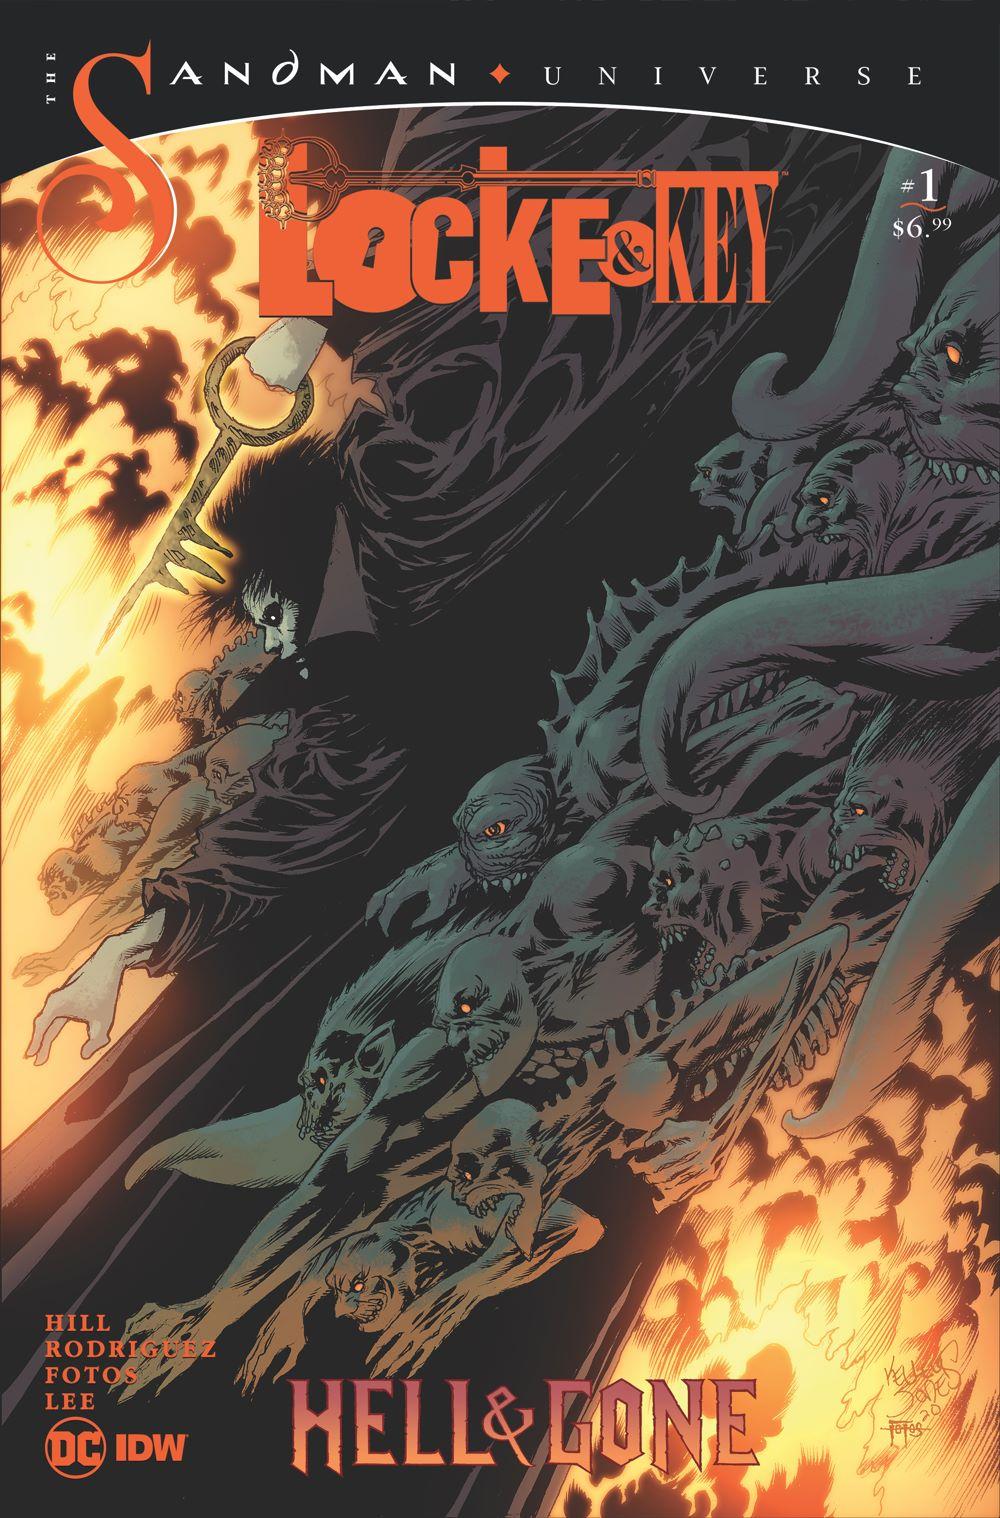 LnK-Sandma-3 ComicList Previews: LOCKE AND KEY THE SANDMAN UNIVERSE HELL AND GONE #1